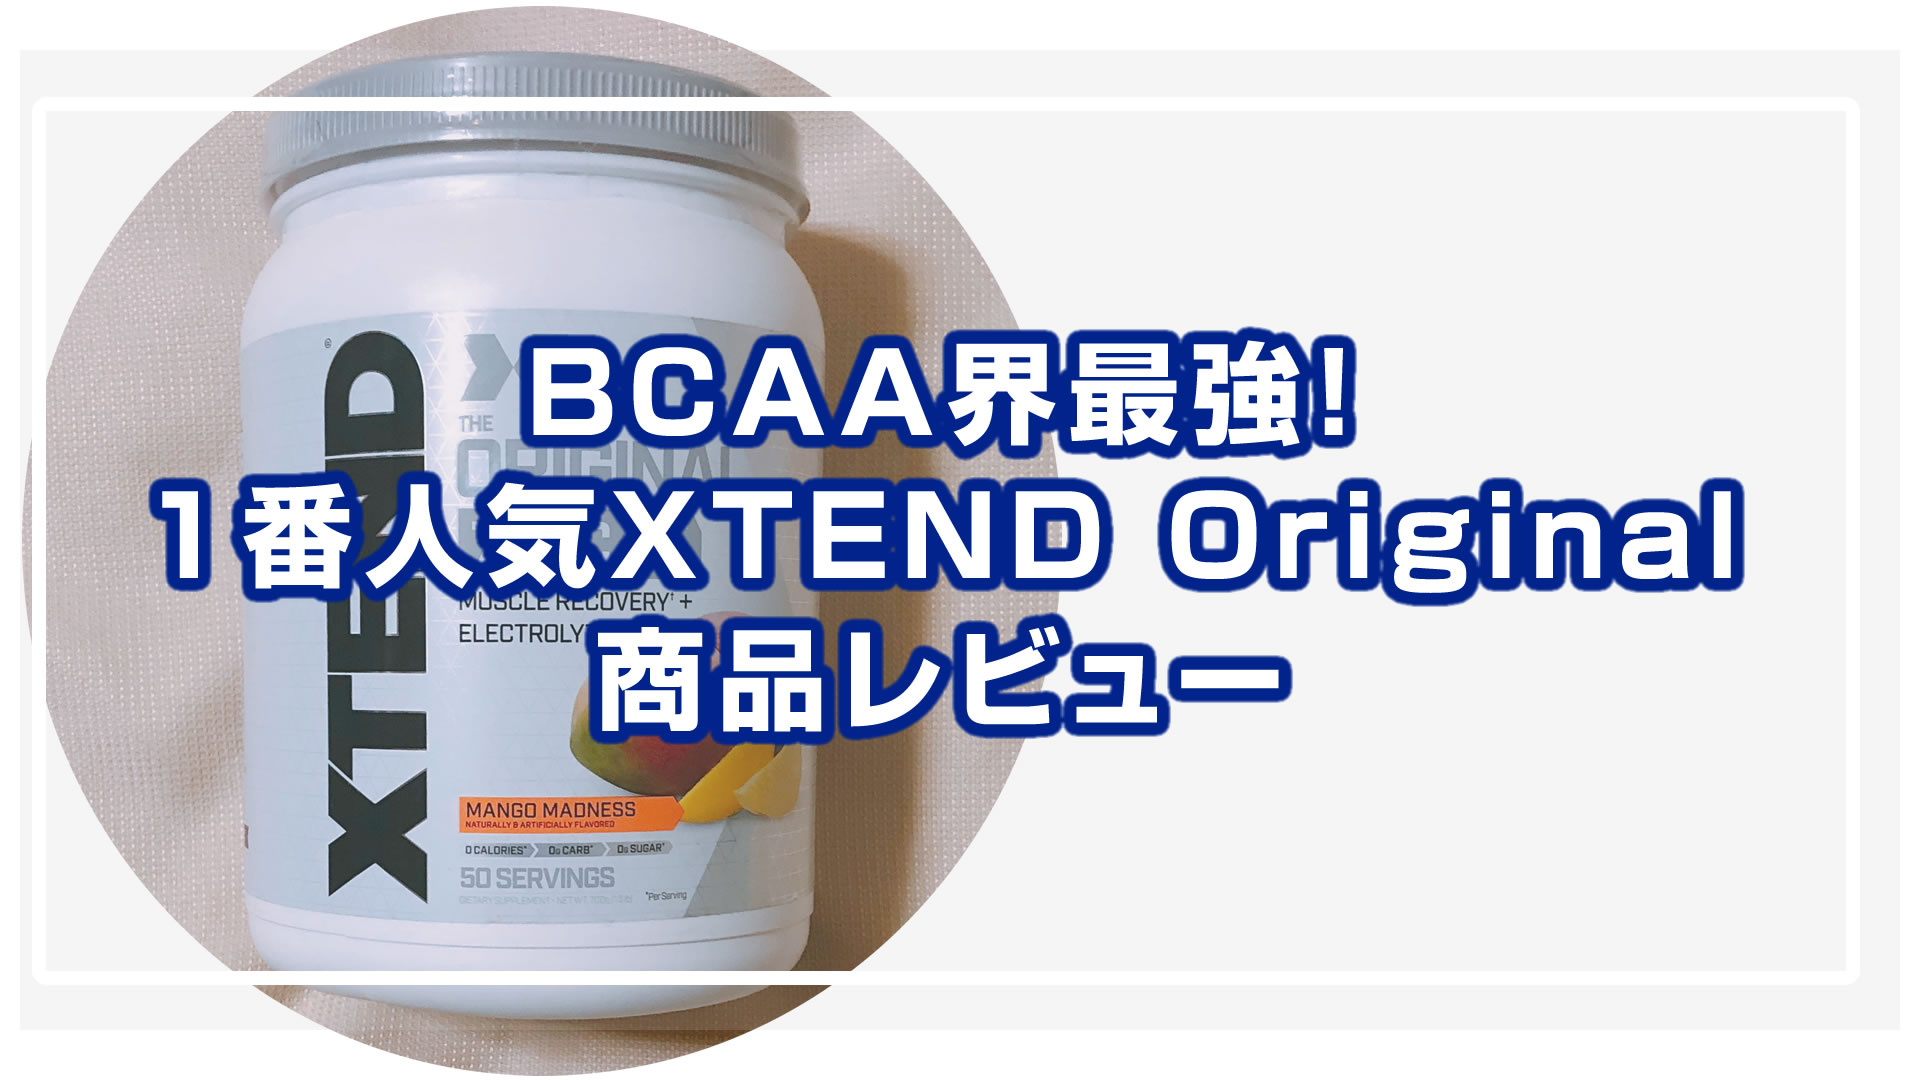 BCAA界1番人気のXTEND Originalの口コミ・レビュー